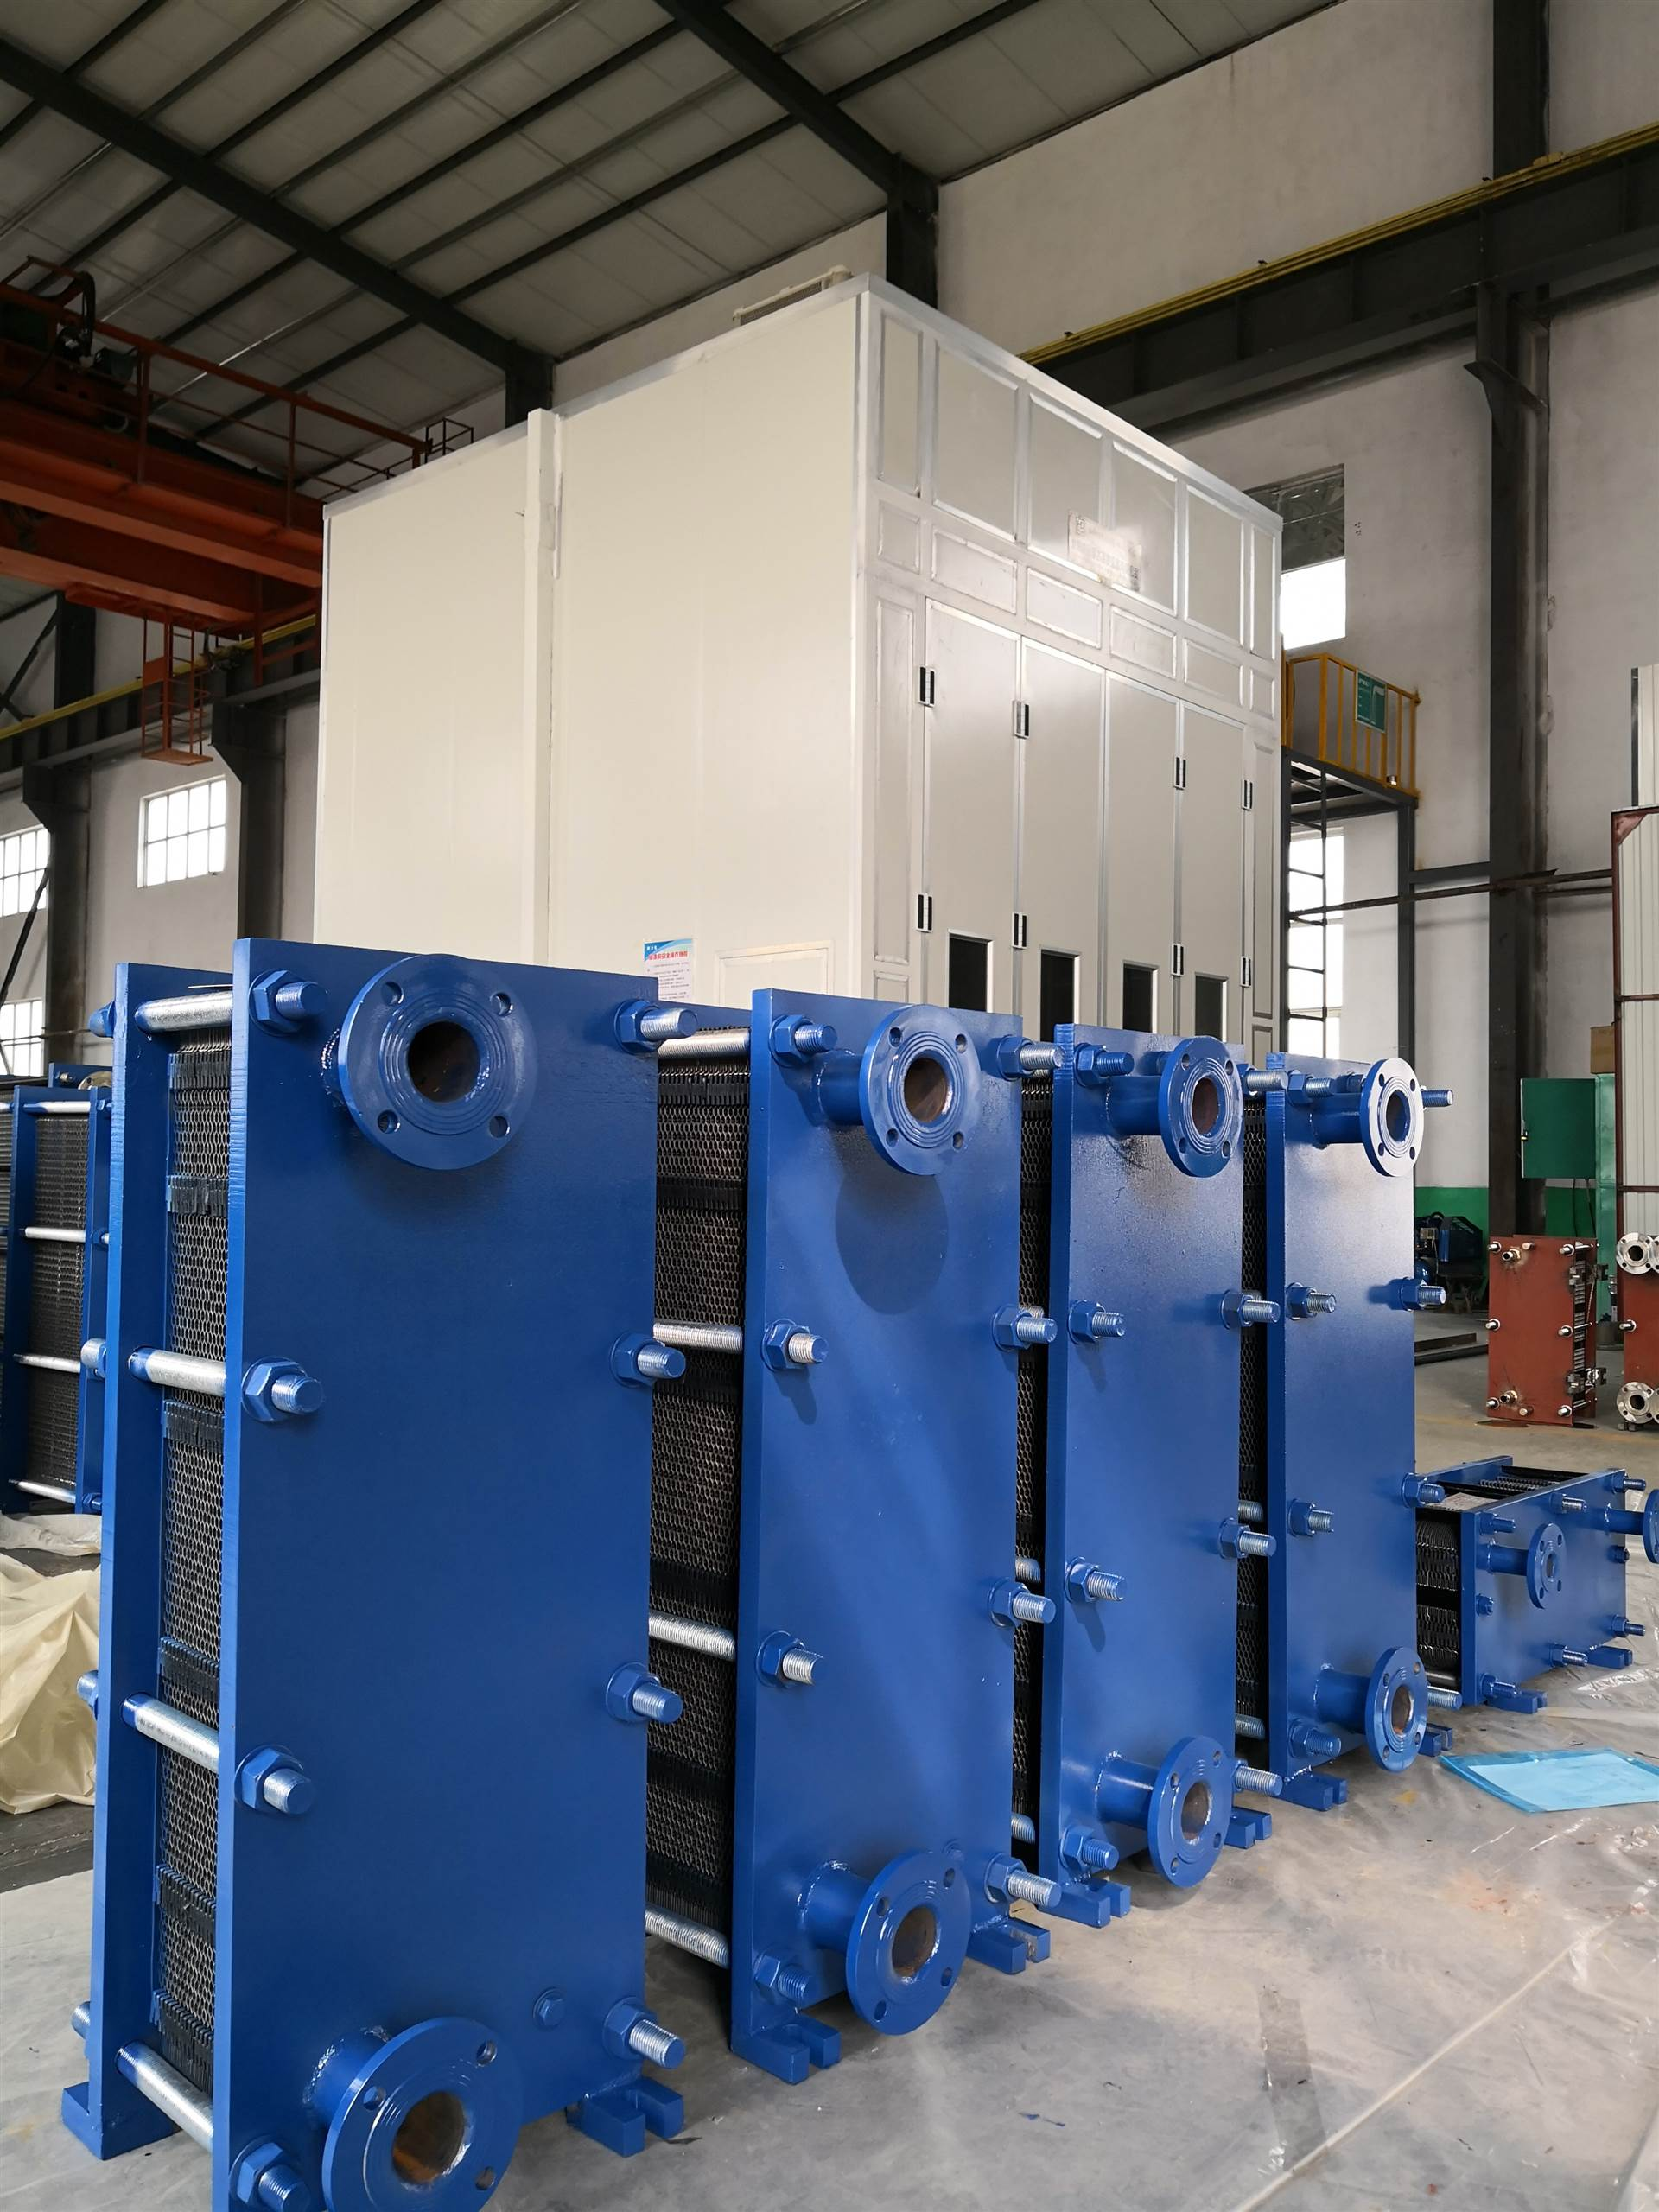 MBR1.8型板式换热器 原理 板式换热器怎么选购